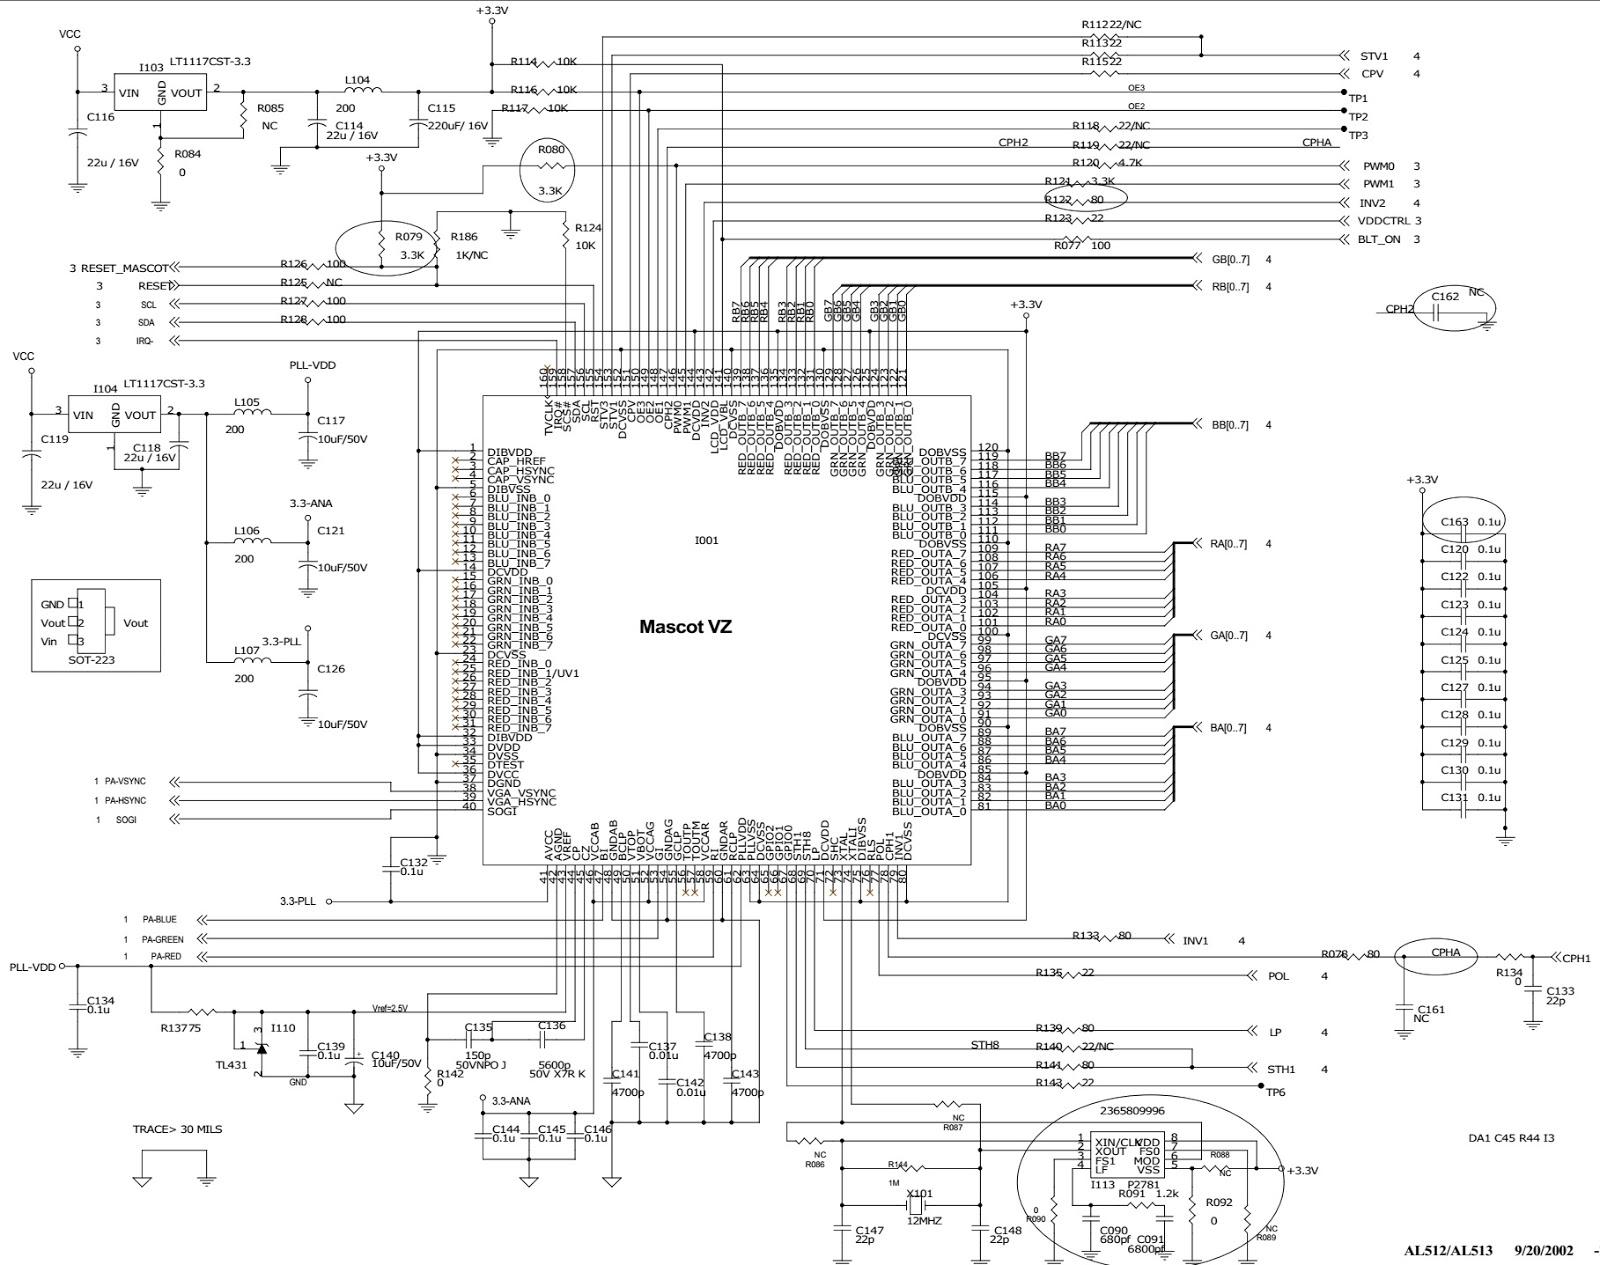 Manguonblog Aoc Al512 Aoc Al513 15 Inch Tft Lcd Monitor Circuit Diagram